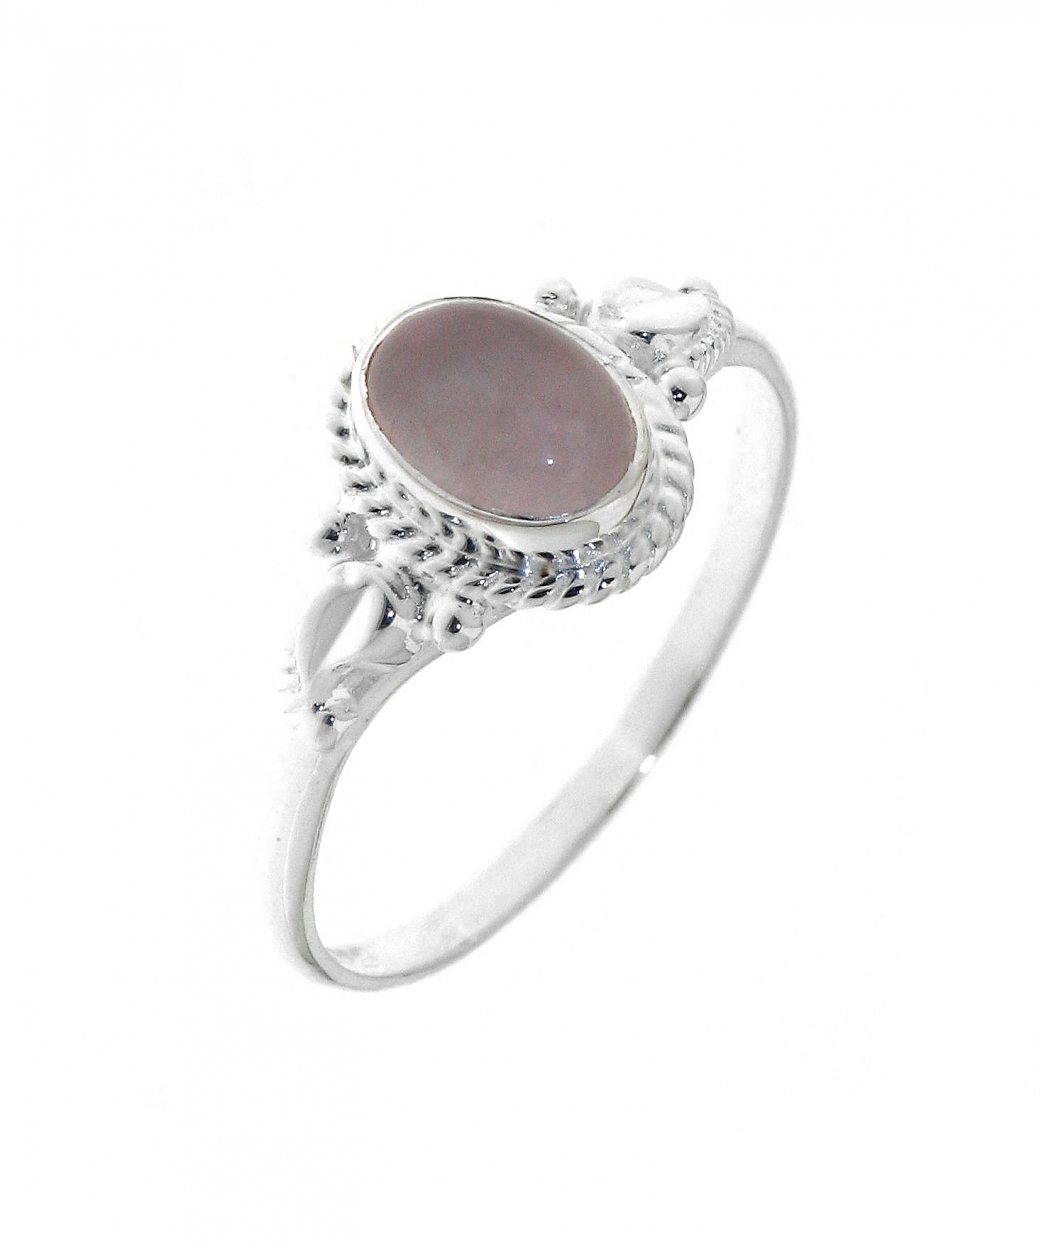 bague argent 925 quartz rose pierre ovale 7x5mm ref 32066. Black Bedroom Furniture Sets. Home Design Ideas